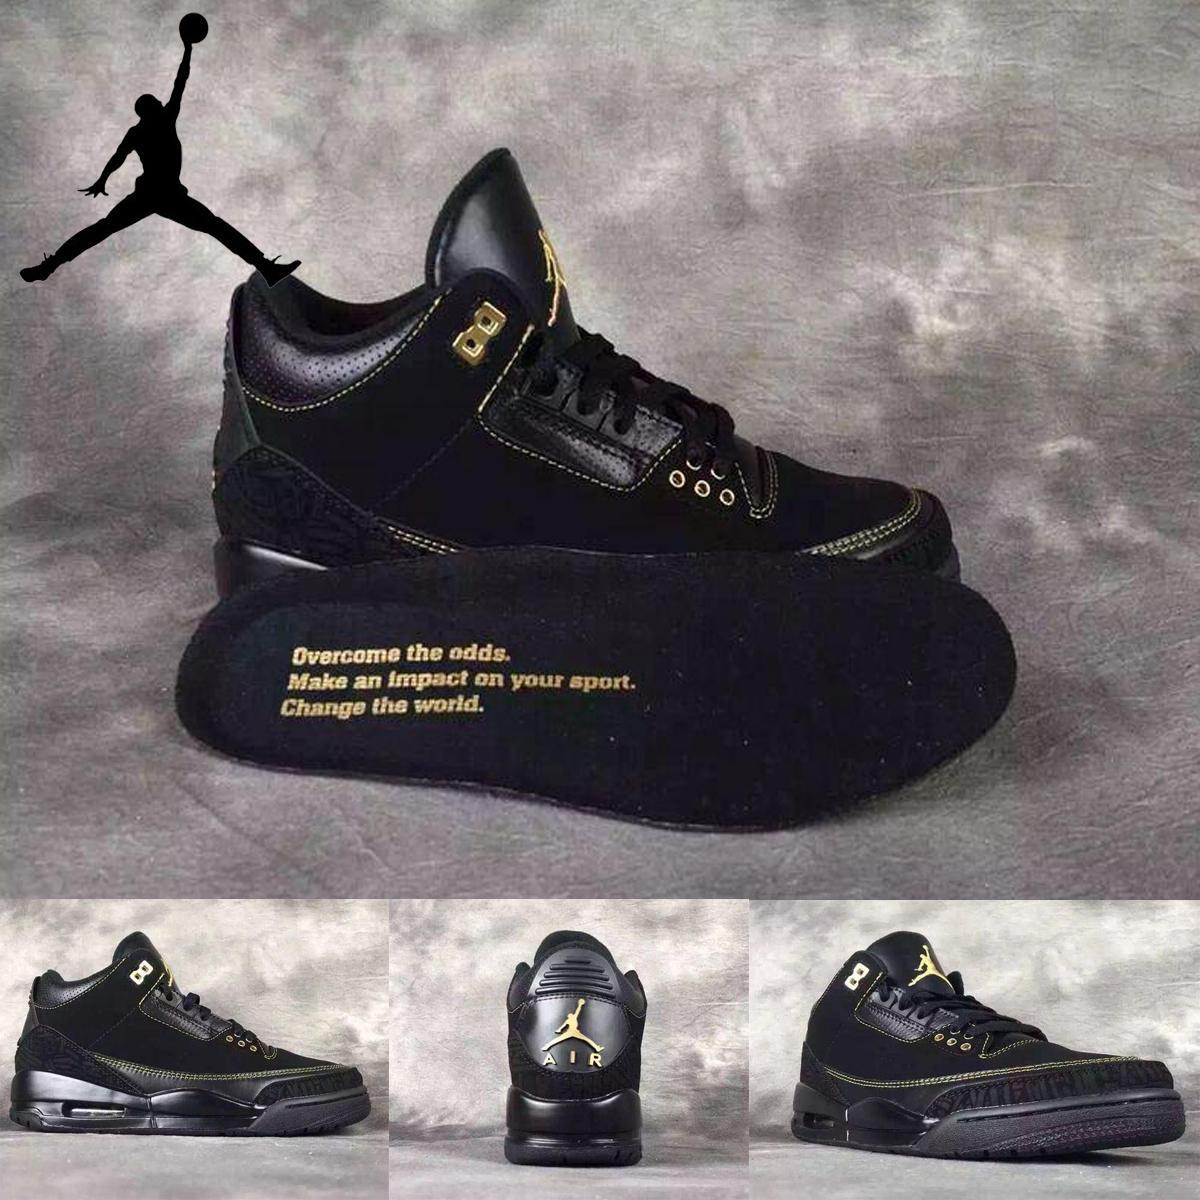 b081d6df6e3a Nike Air Jordan 3 Iii Black History Month Mens Basketball Shoes Aaa ...